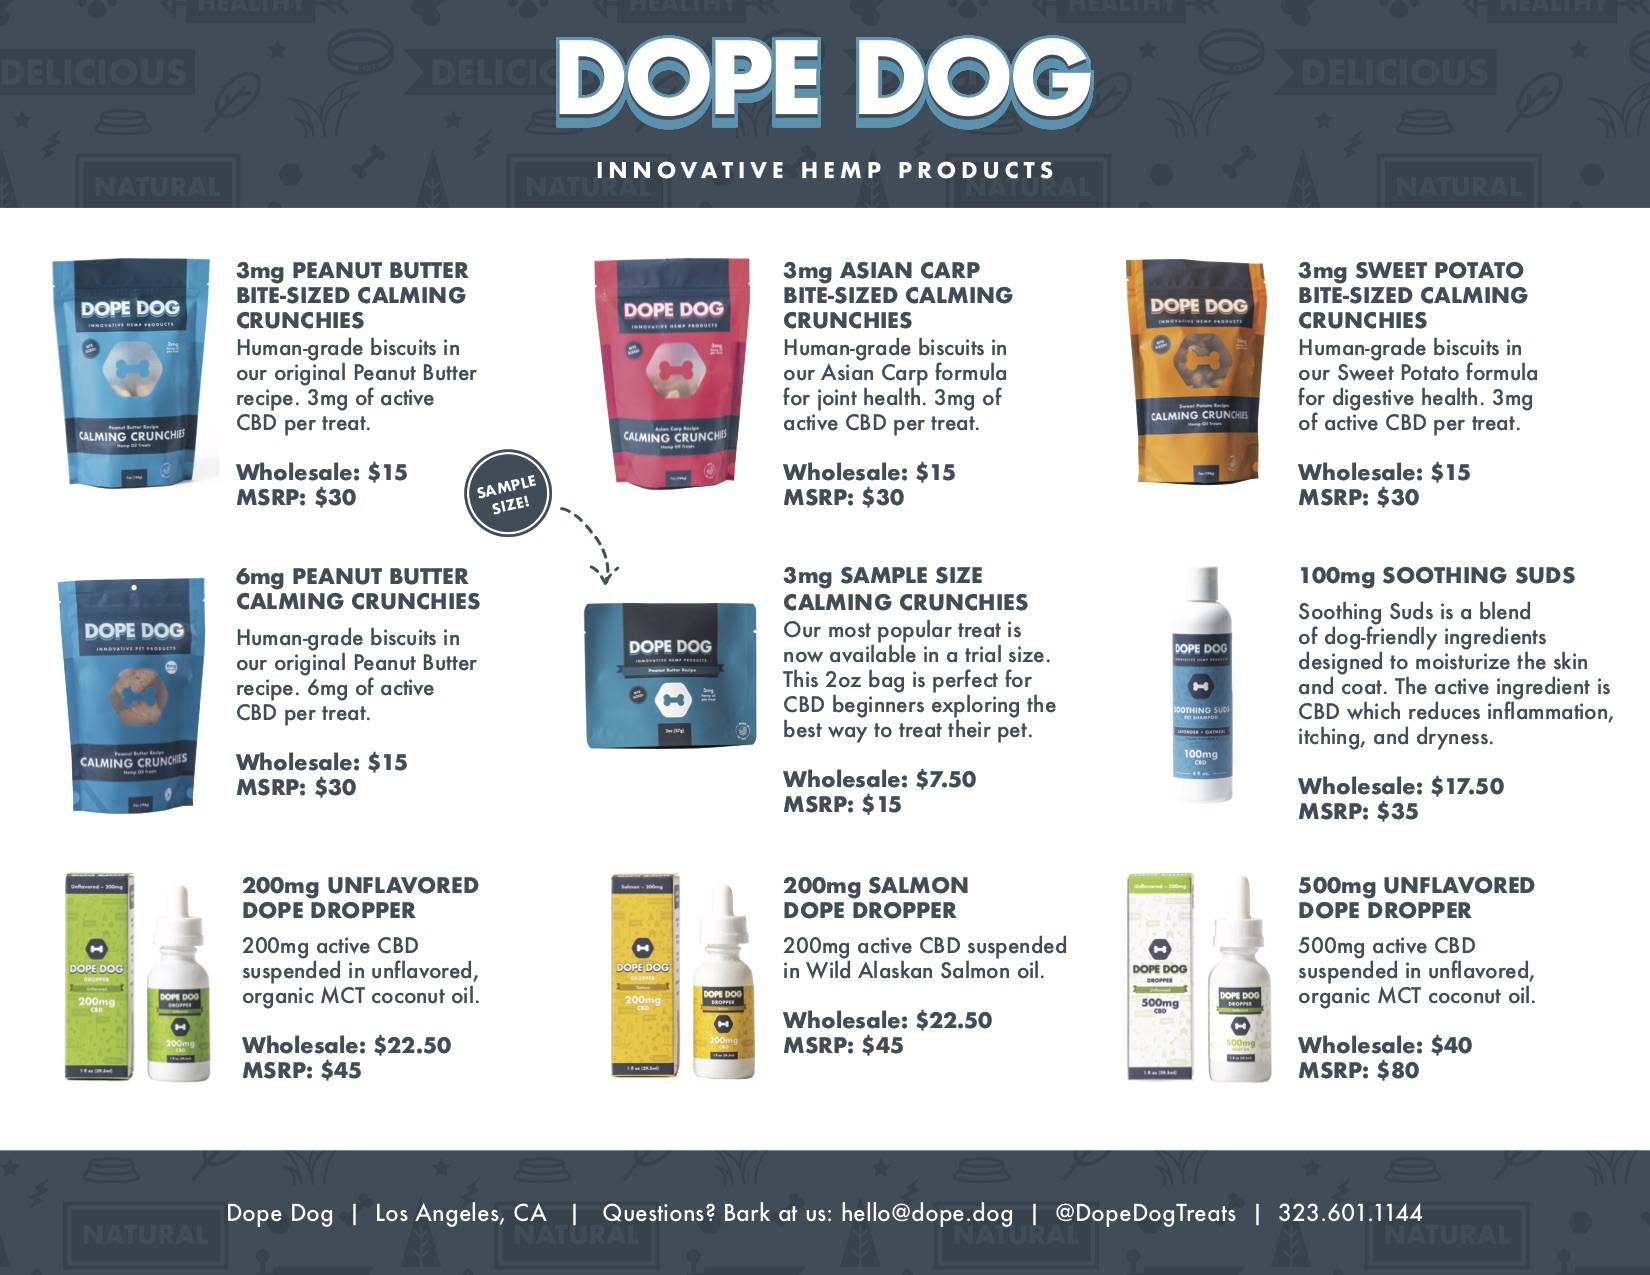 Dope Dog Hemp Products